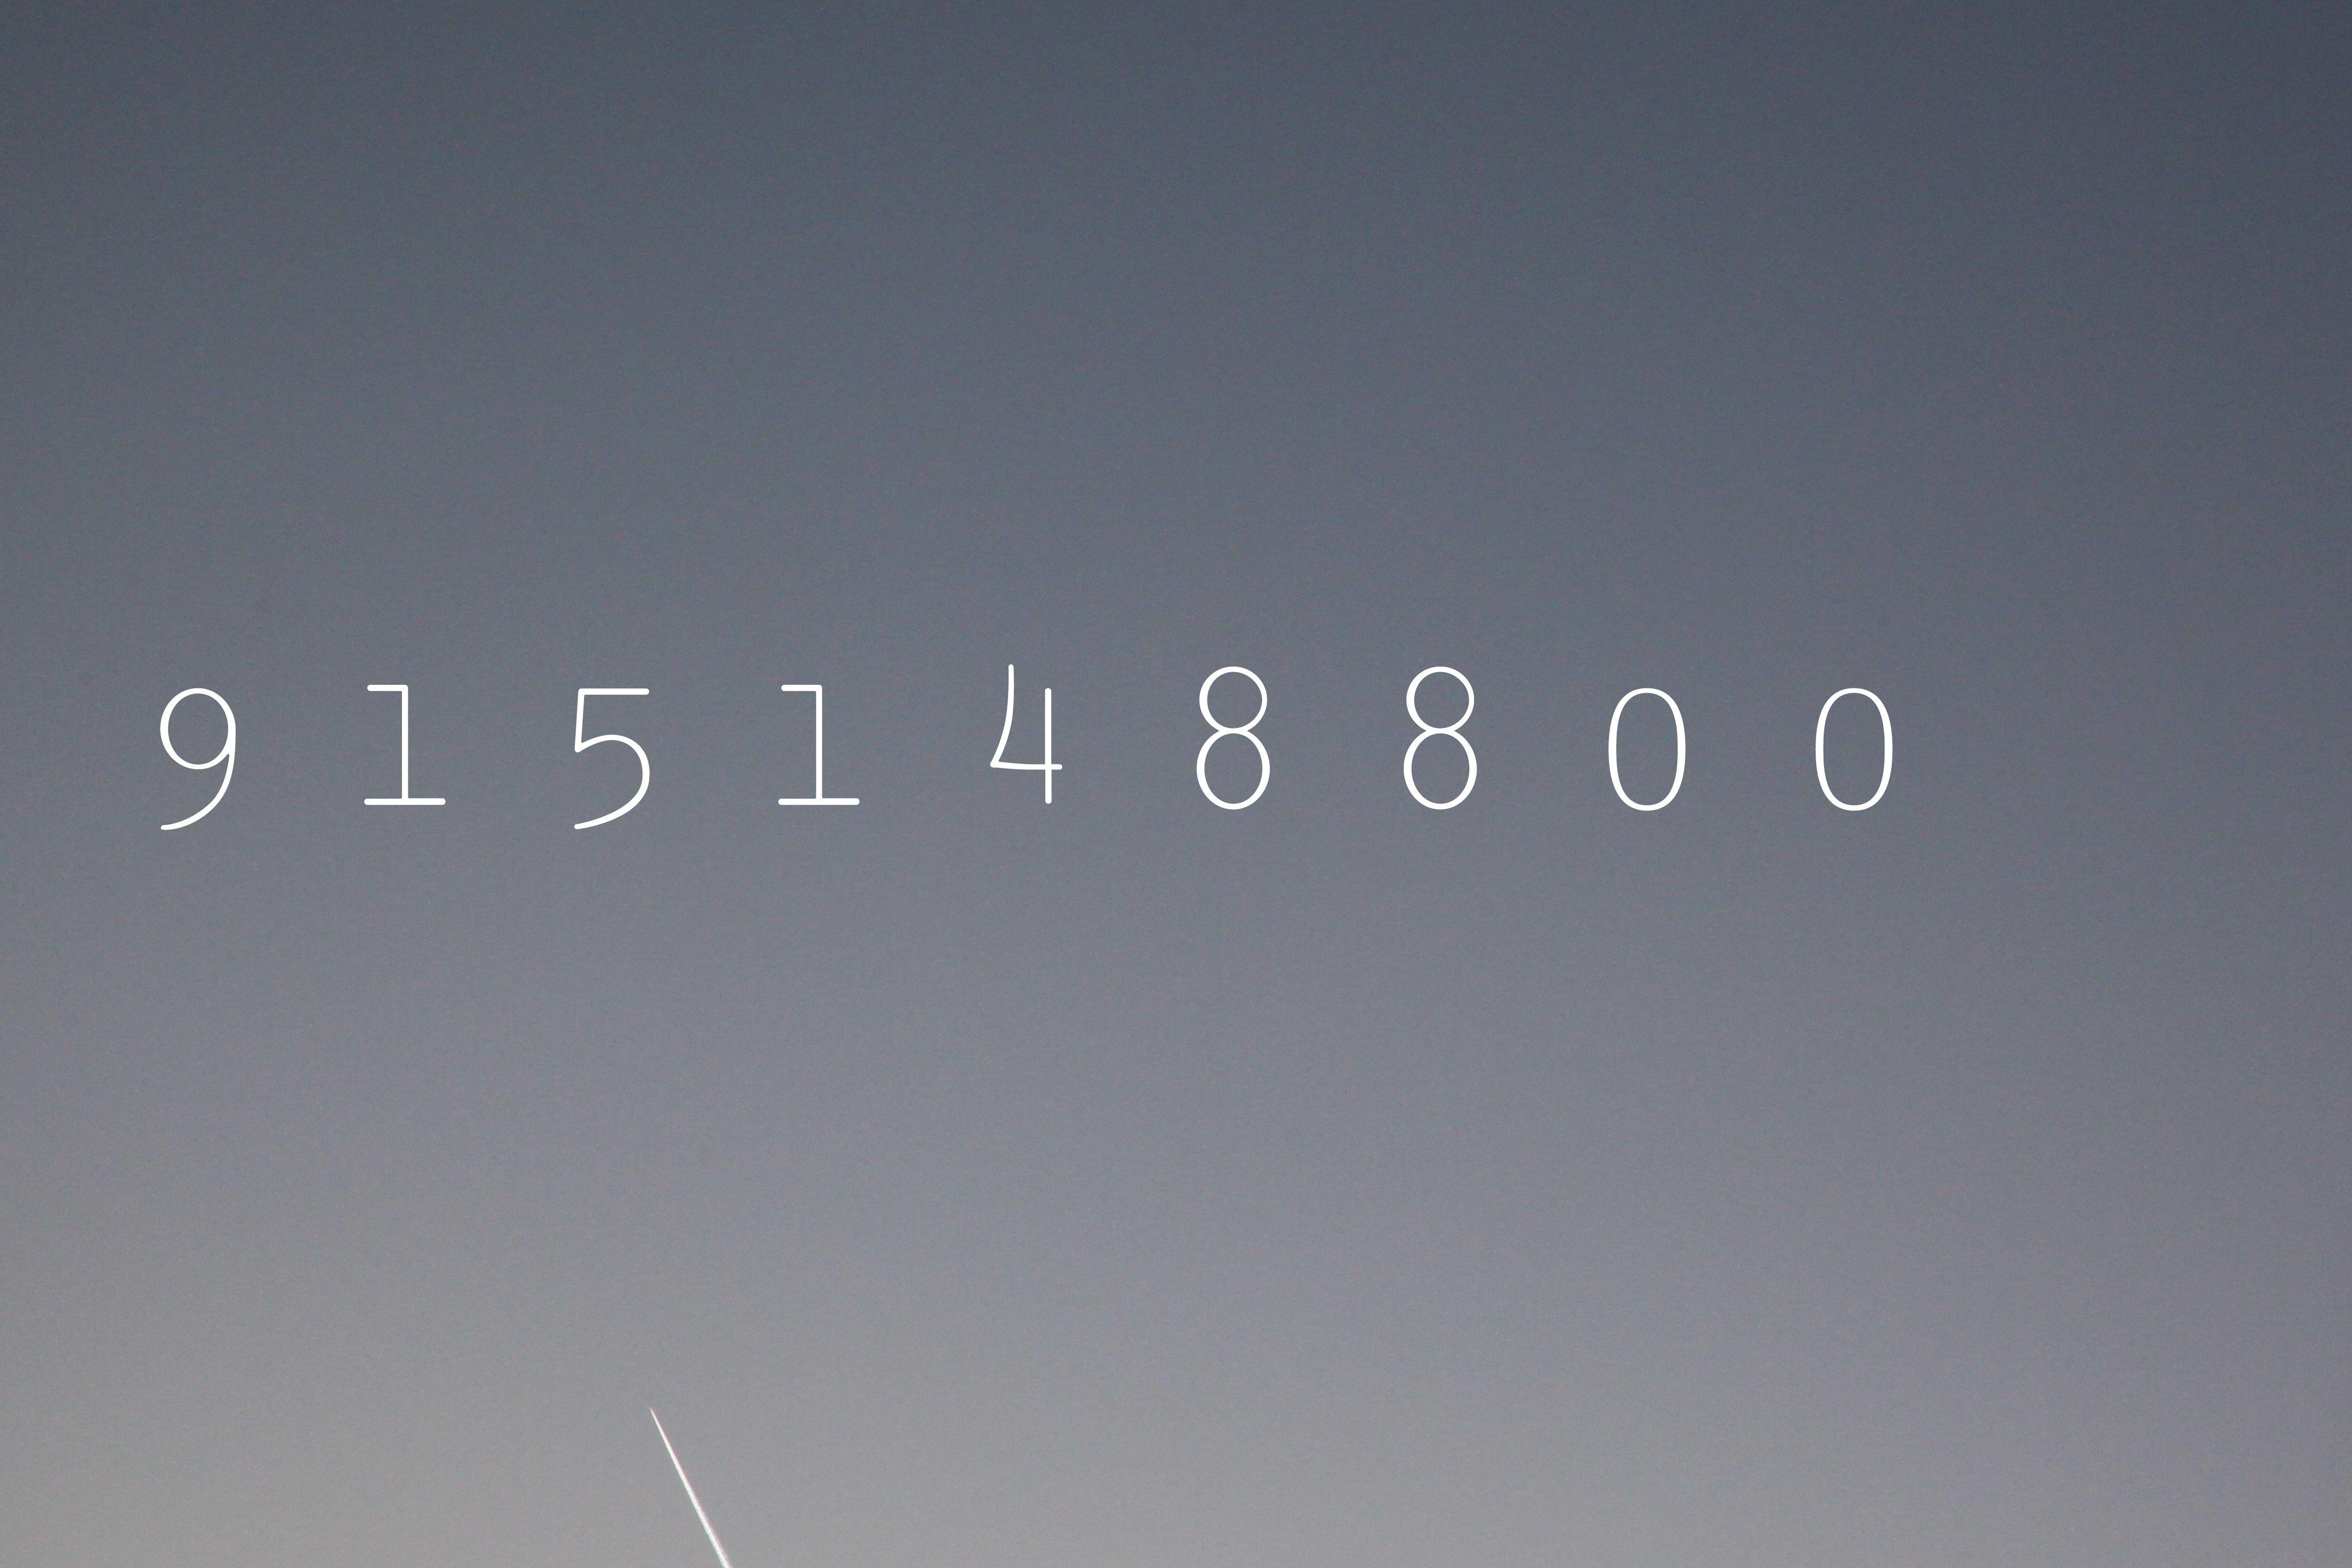 Leap Second, 31 December 1998 - 23:59:60